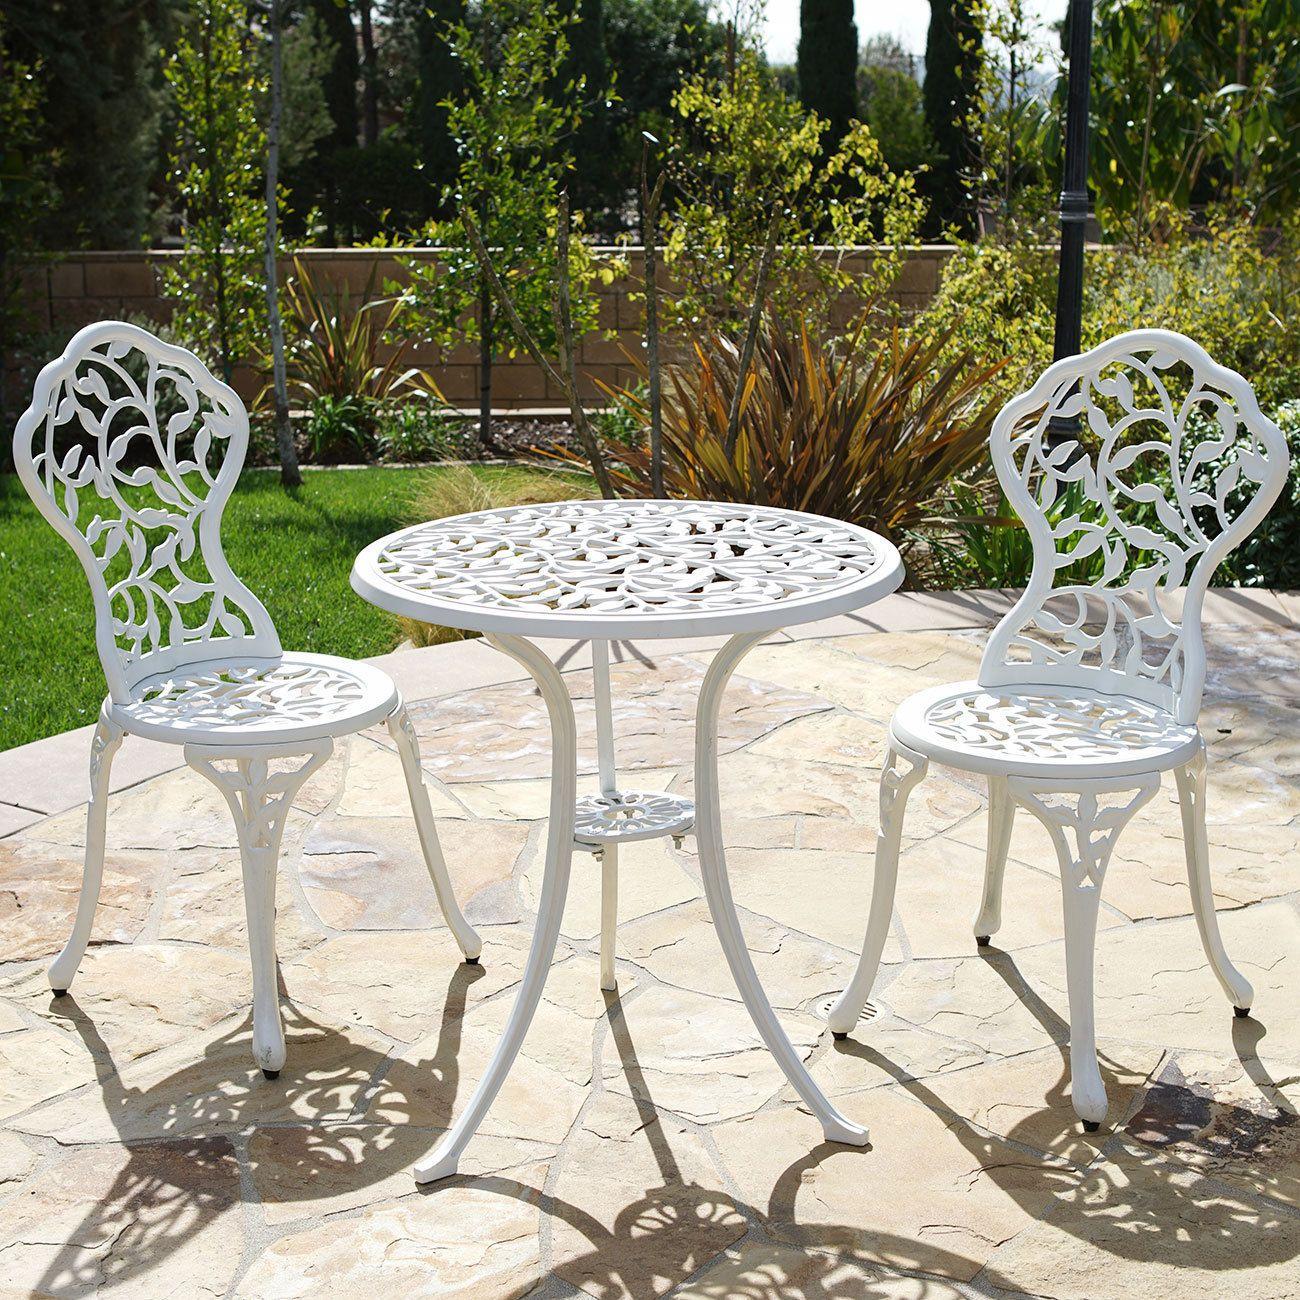 patio table chairs set ivory iron furniture balcony pool bistro rh pinterest com